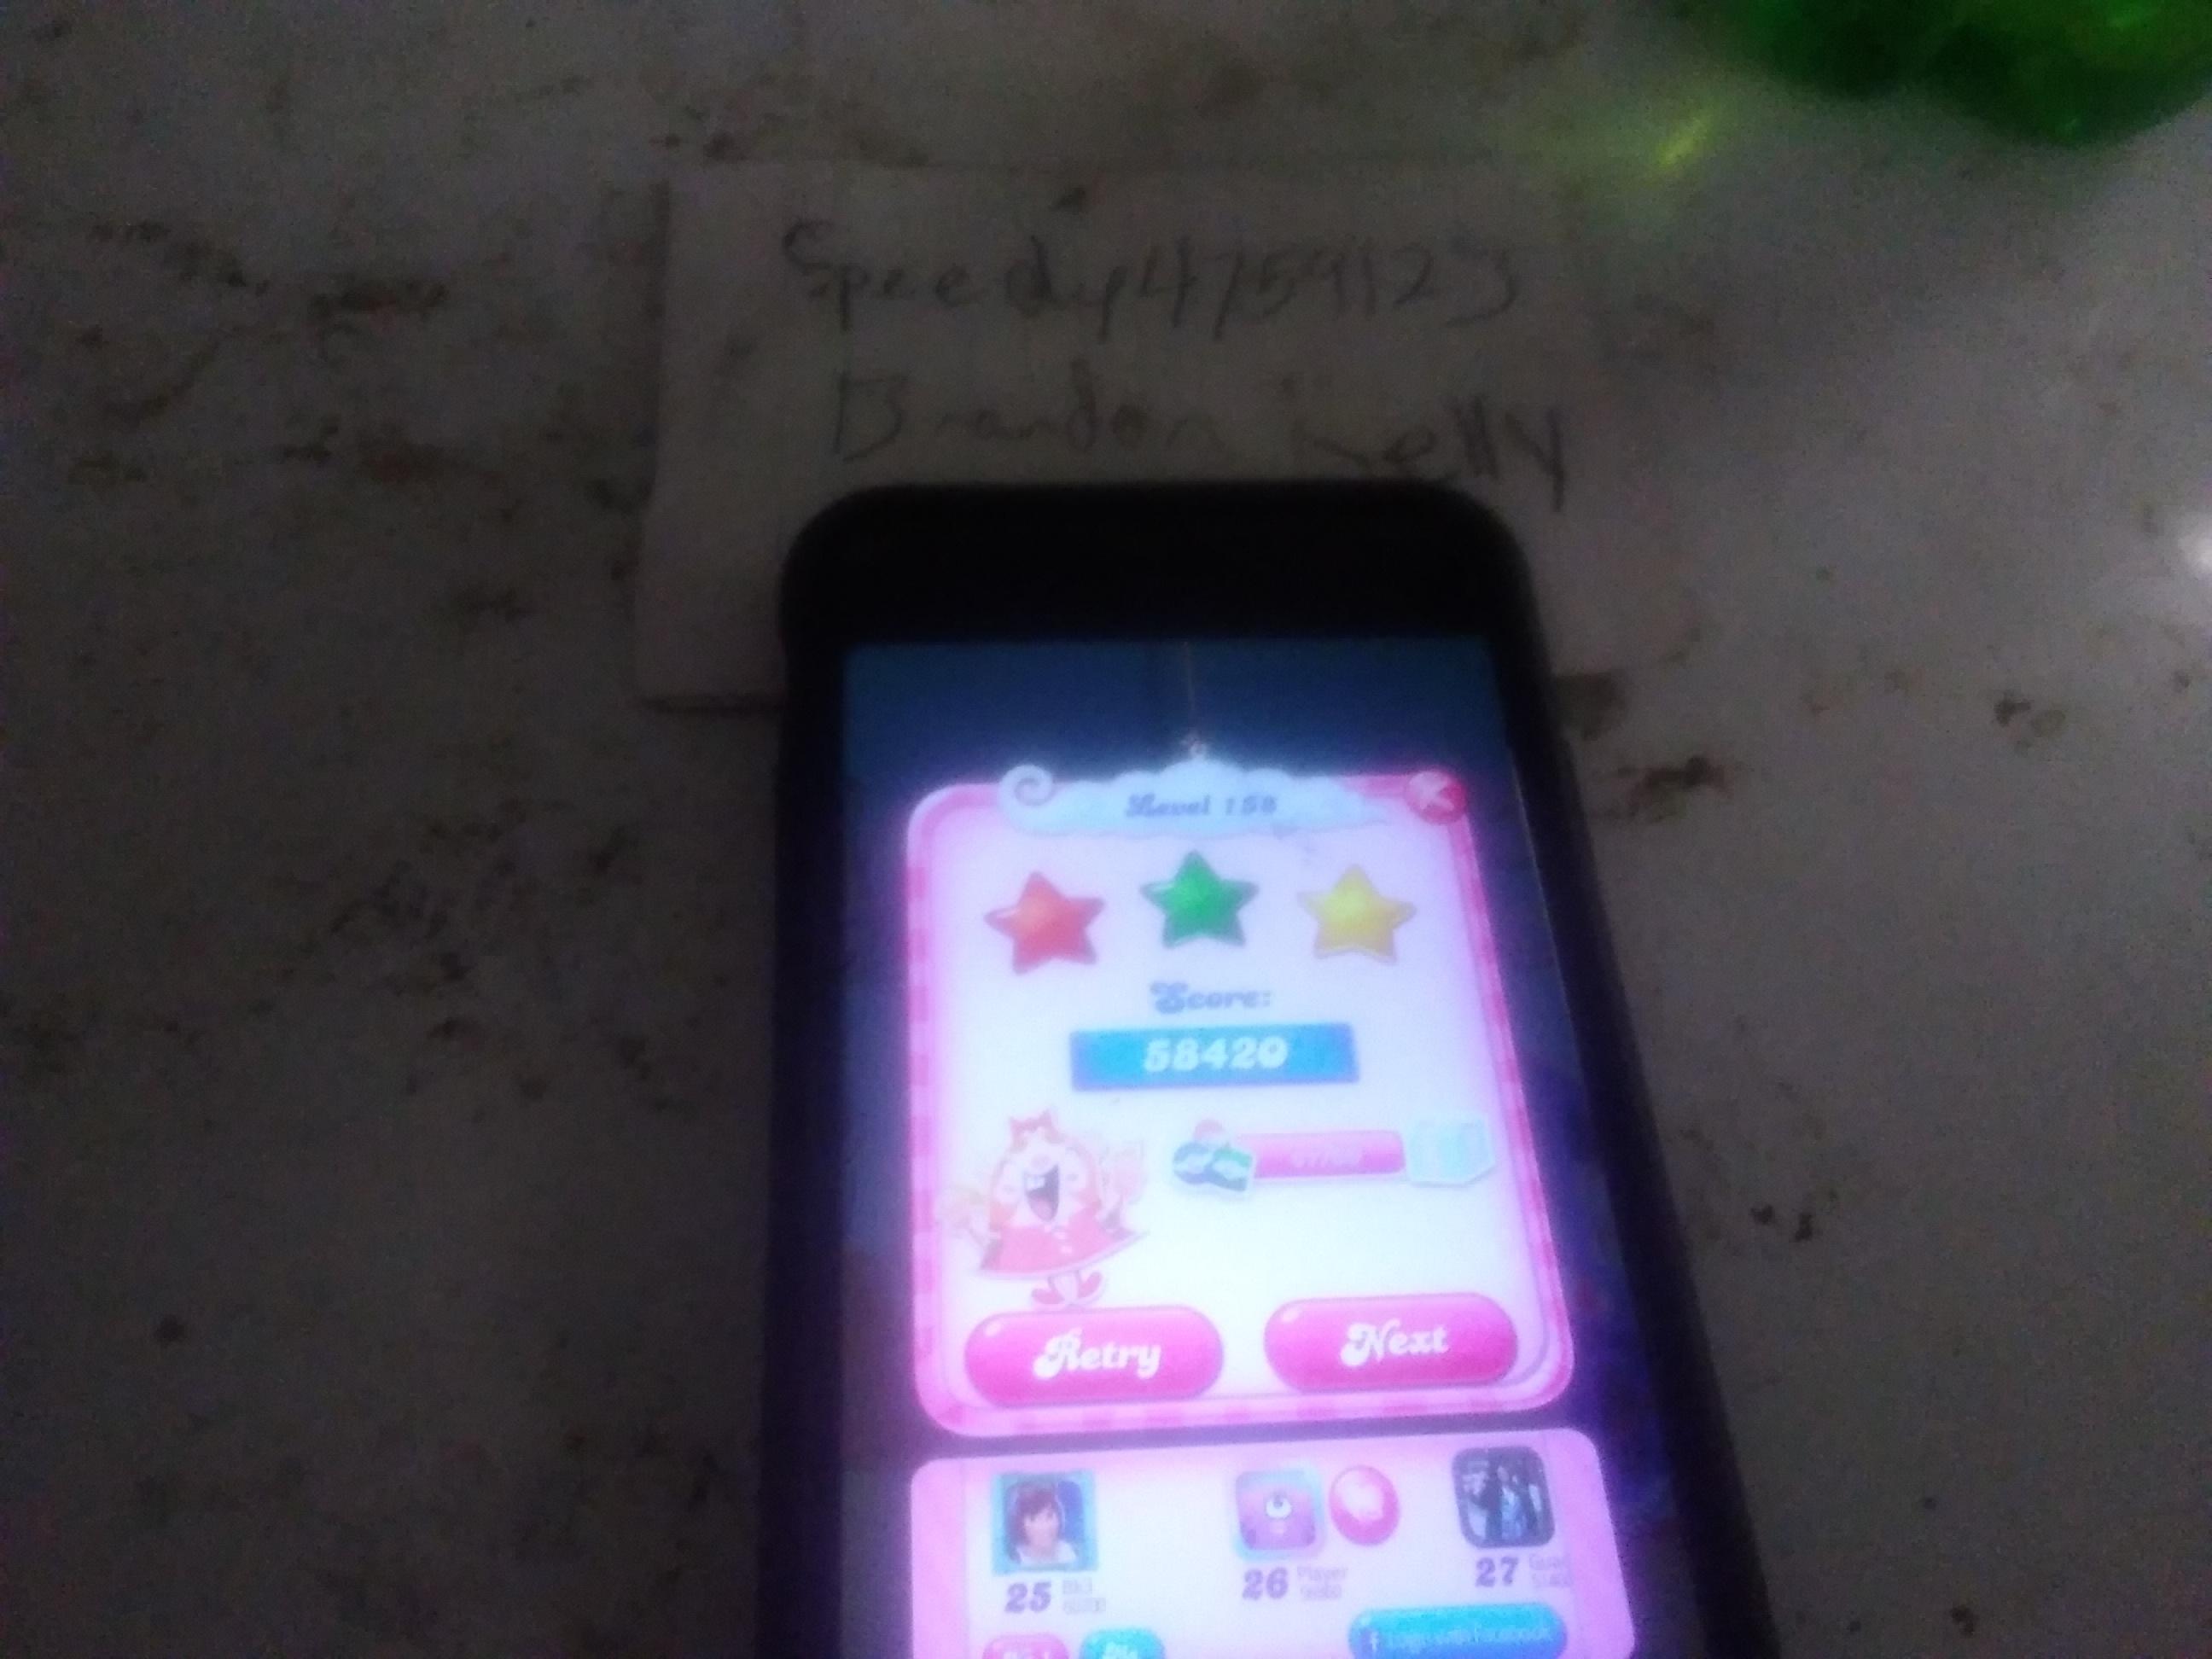 speedy4759123: Candy Crush Saga: Level 158 (iOS) 58,420 points on 2019-08-13 11:09:10